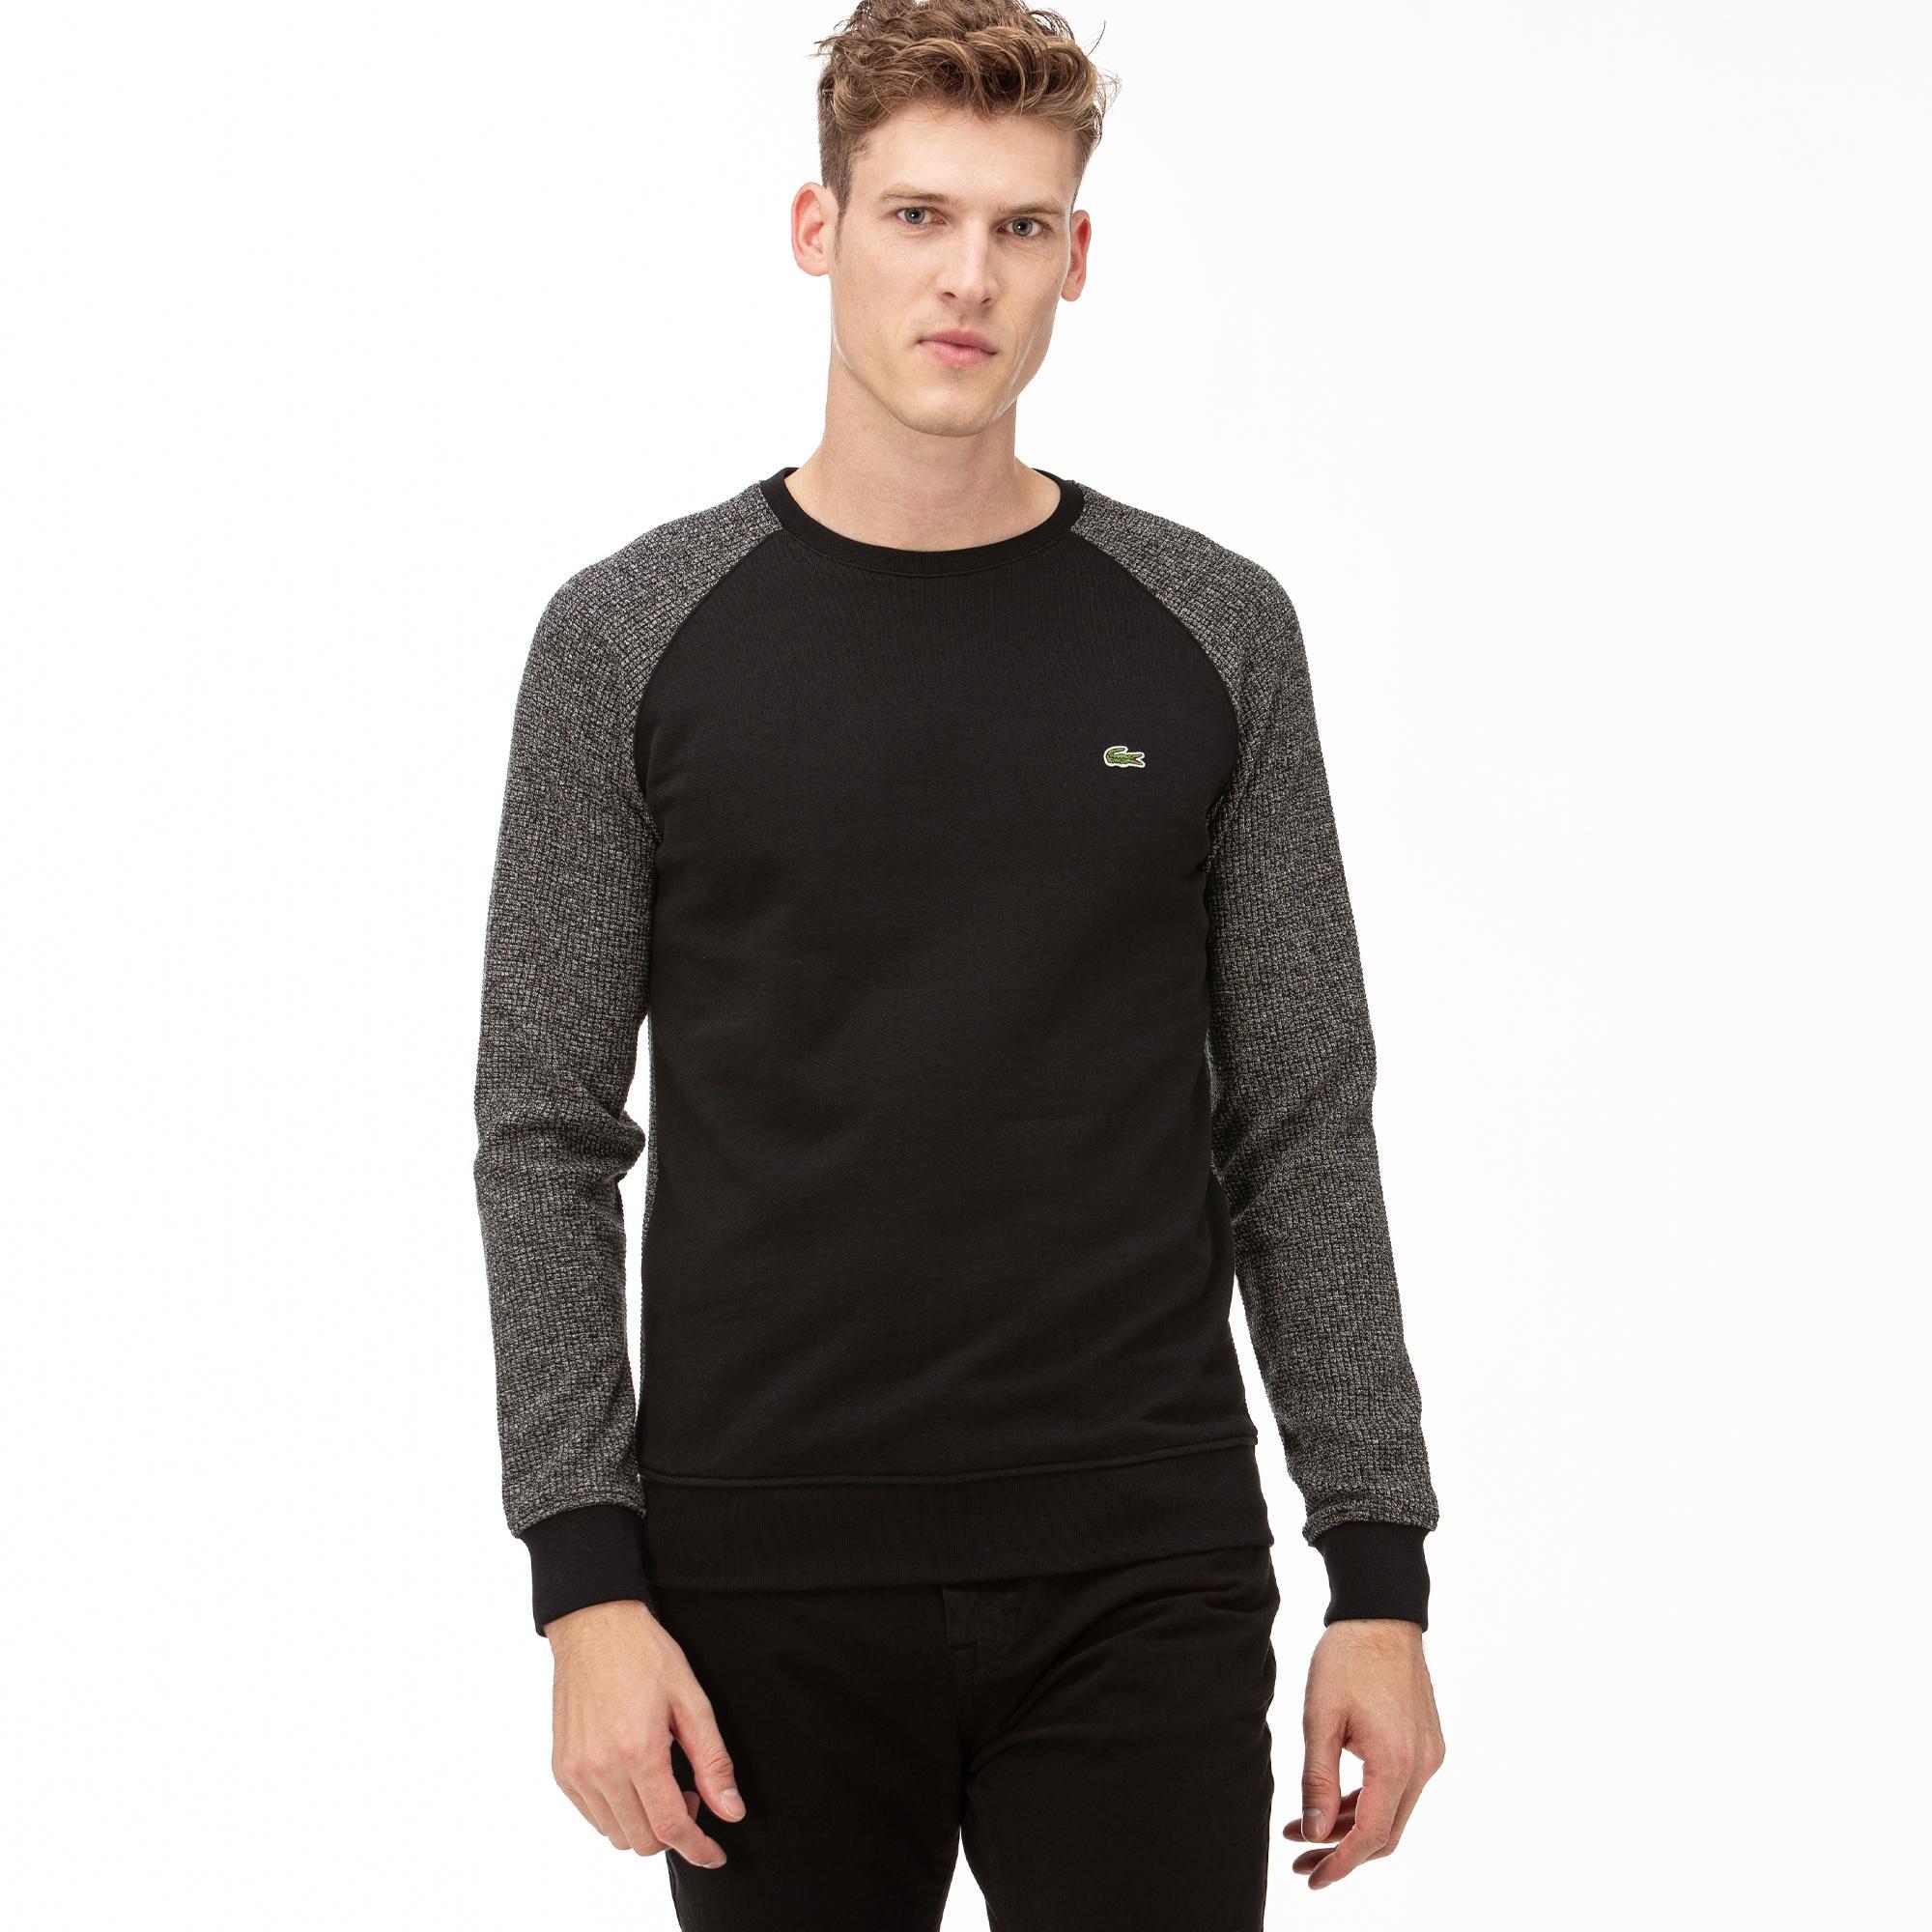 Lacoste Erkek Siyah Uzun Kollu Sweatshirt